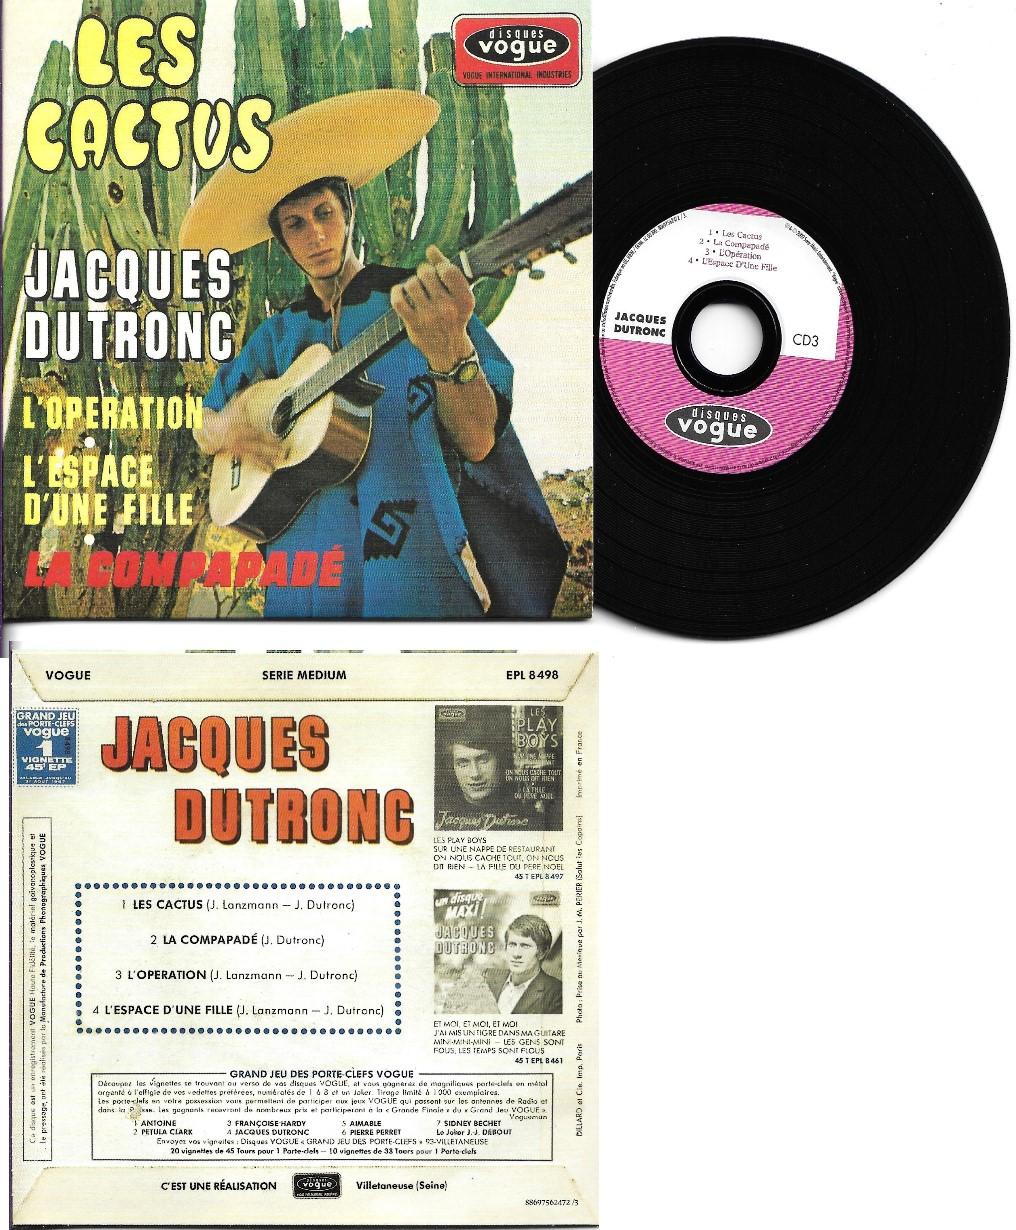 JACQUES DUTRONC - Les cactus CARD SLEEVE EP REPLICA 4-TRACK CARD SLEEVE - CD single